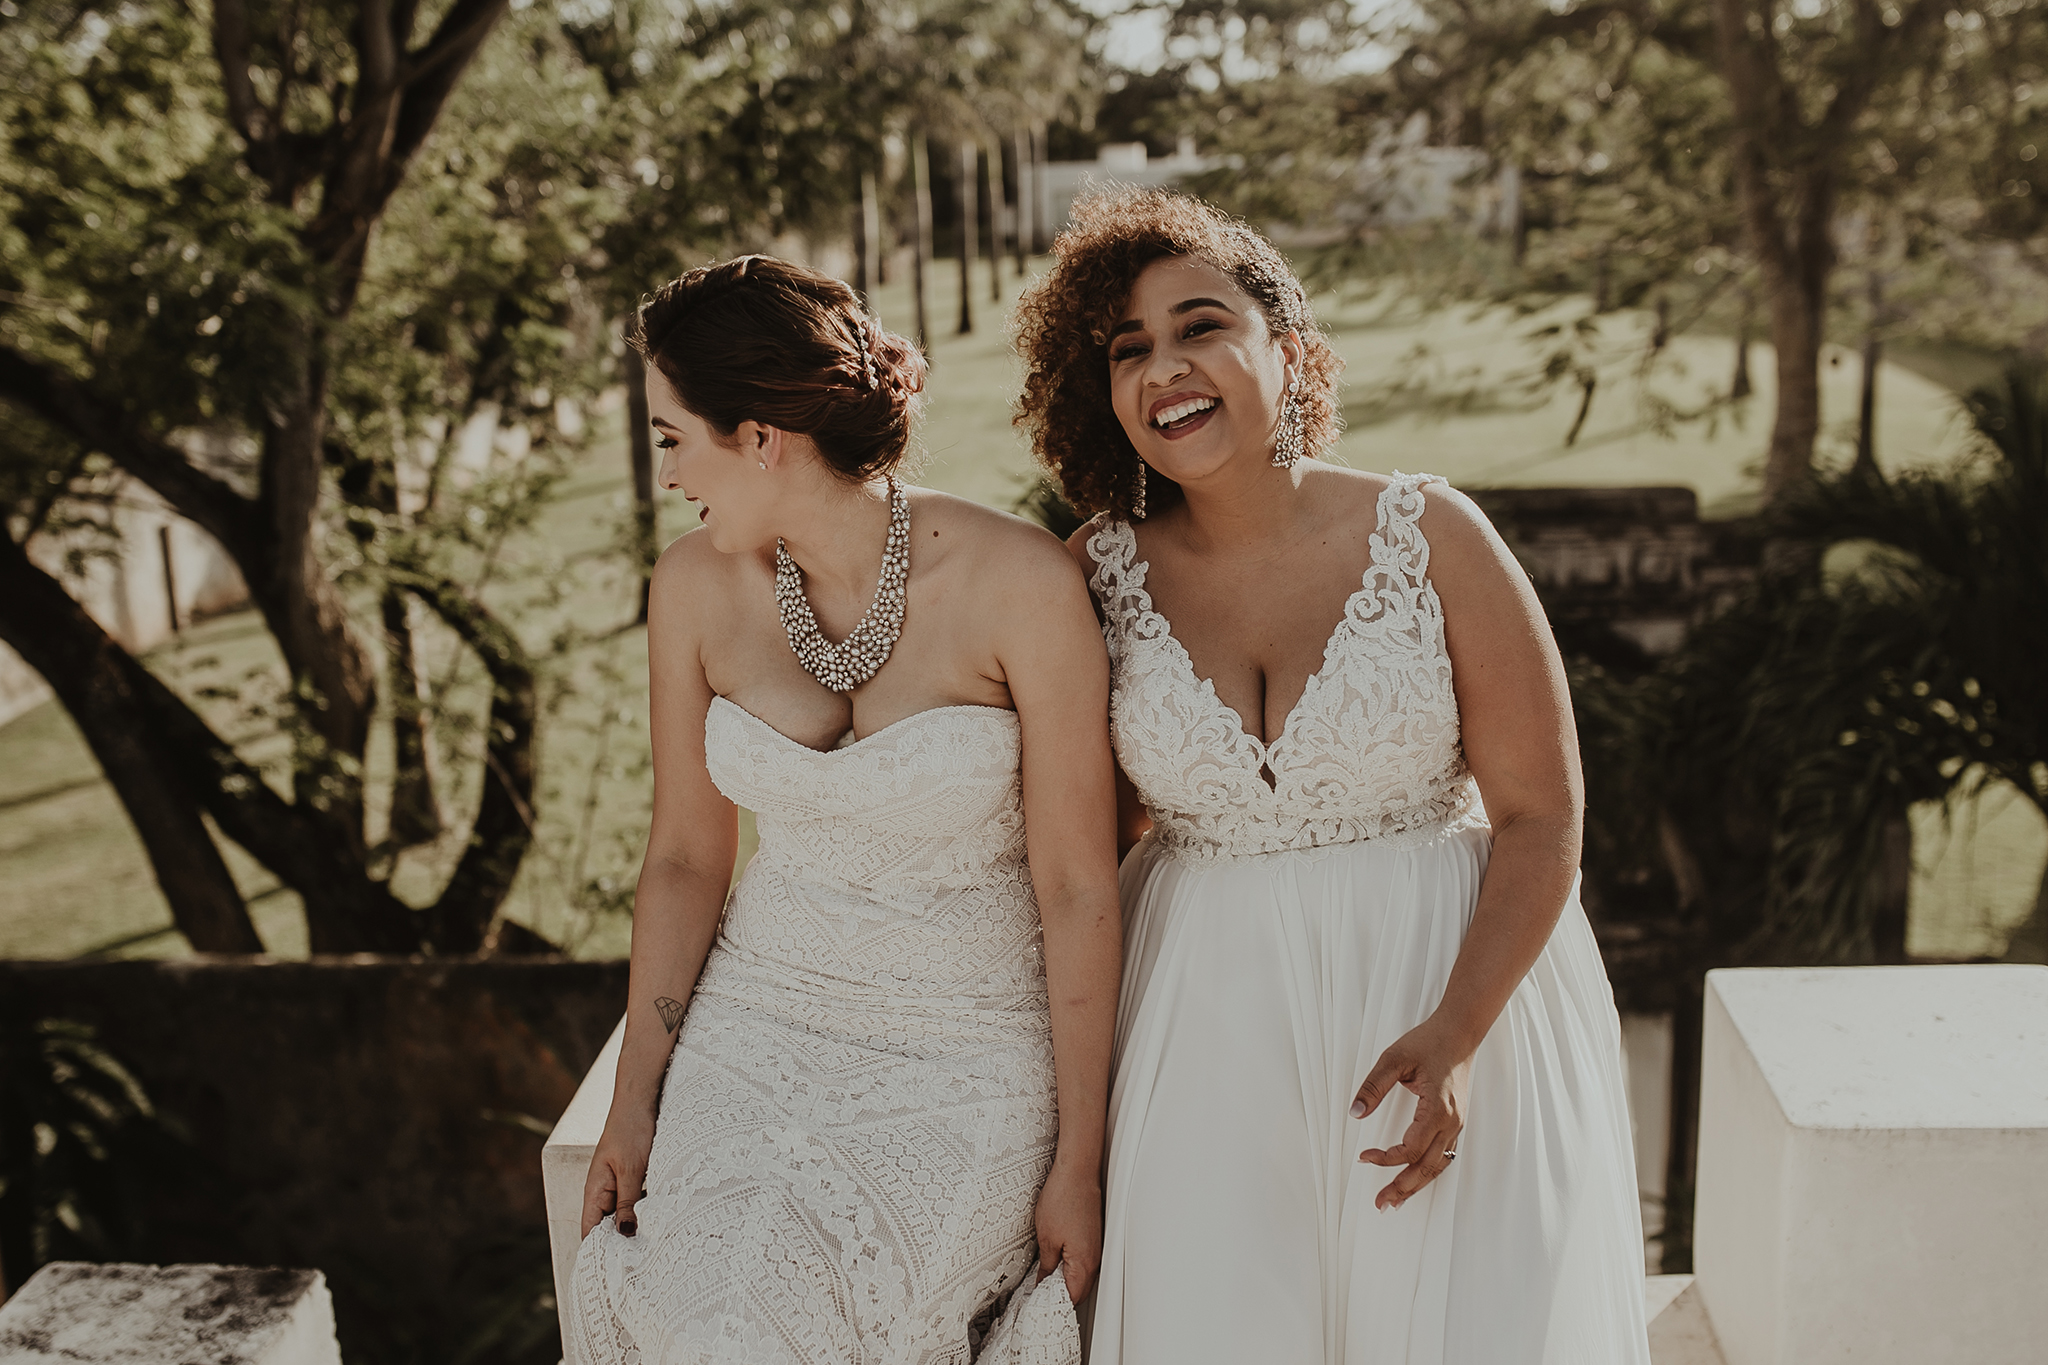 0204V&Aslide_HaciendaSacChic_WeddingGay_WeddingDstination_MeridaYucatan_HaciendasMerida_BodasMexico_BodasYucatan_Boda_Destino.jpg